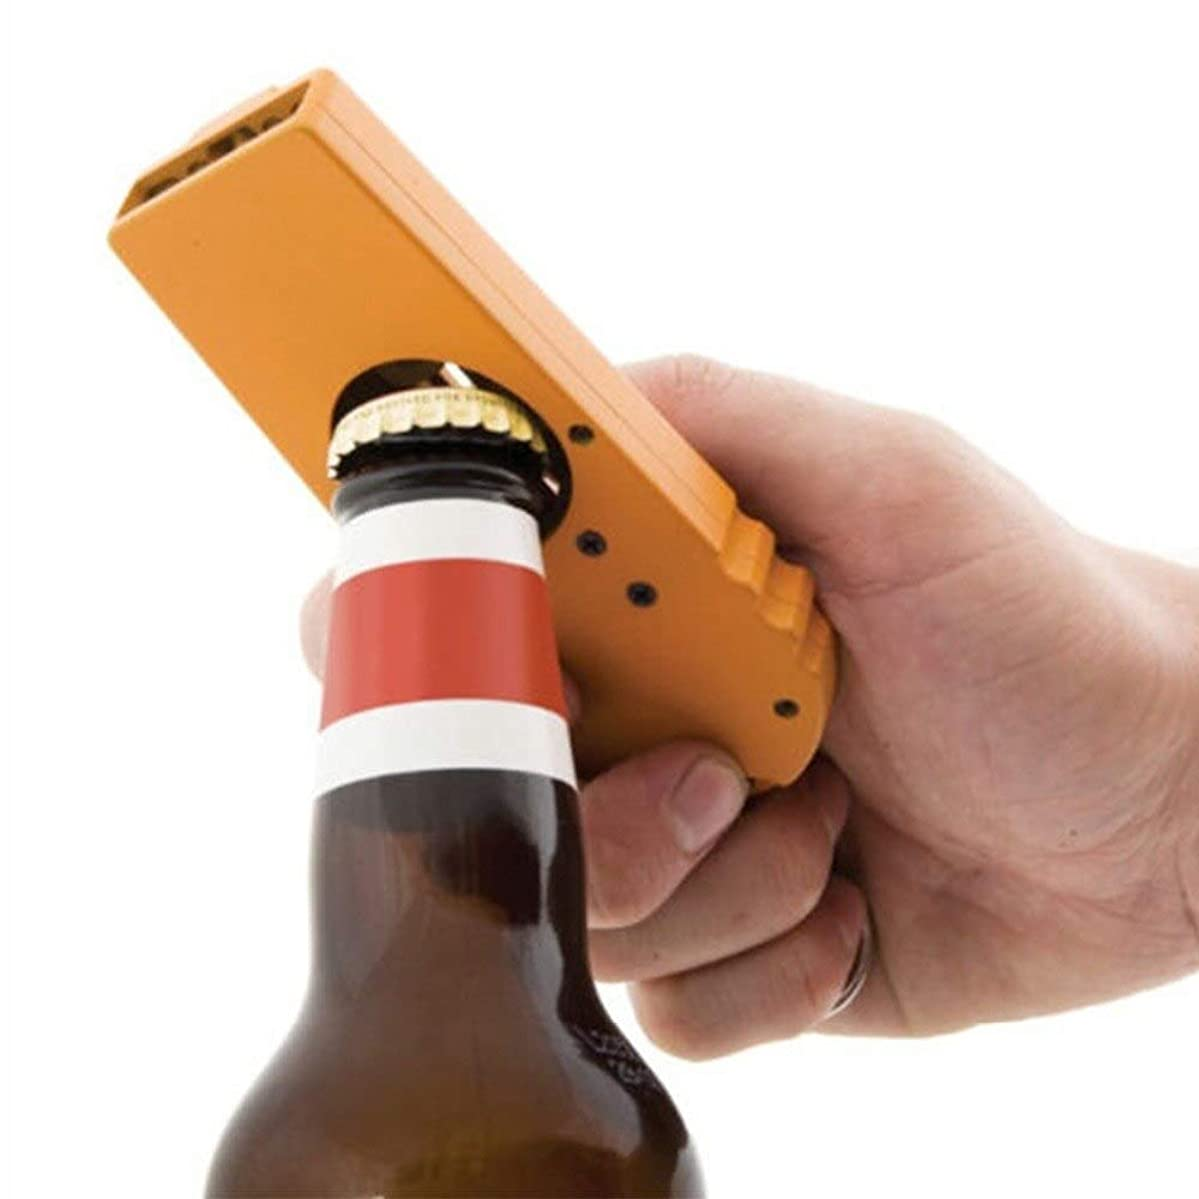 Bottle Opener - Plastic Flying Cap Zappa Beer Opener Wine Liquor Alcohol Bottle Ejection Gun Ejector Design - Bulk Deer Caps Divot Parts Glitter Cute Name Threaded Multi Rechargeable Electric